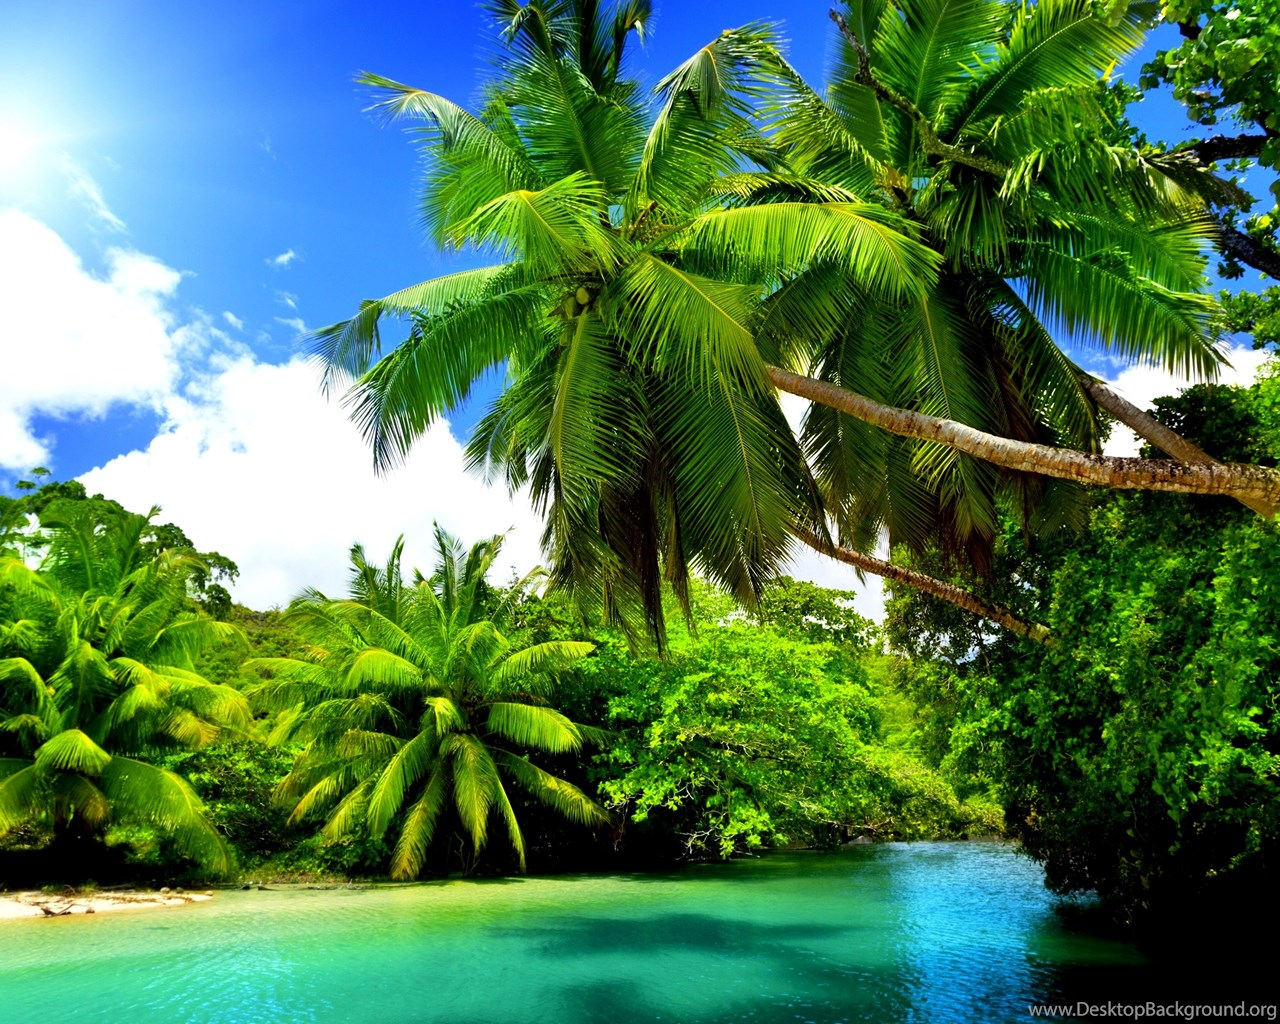 Pretty Nature Backgrounds Wallpapertag: Pretty Nature Wallpapers Full HD Nekeran.com Desktop